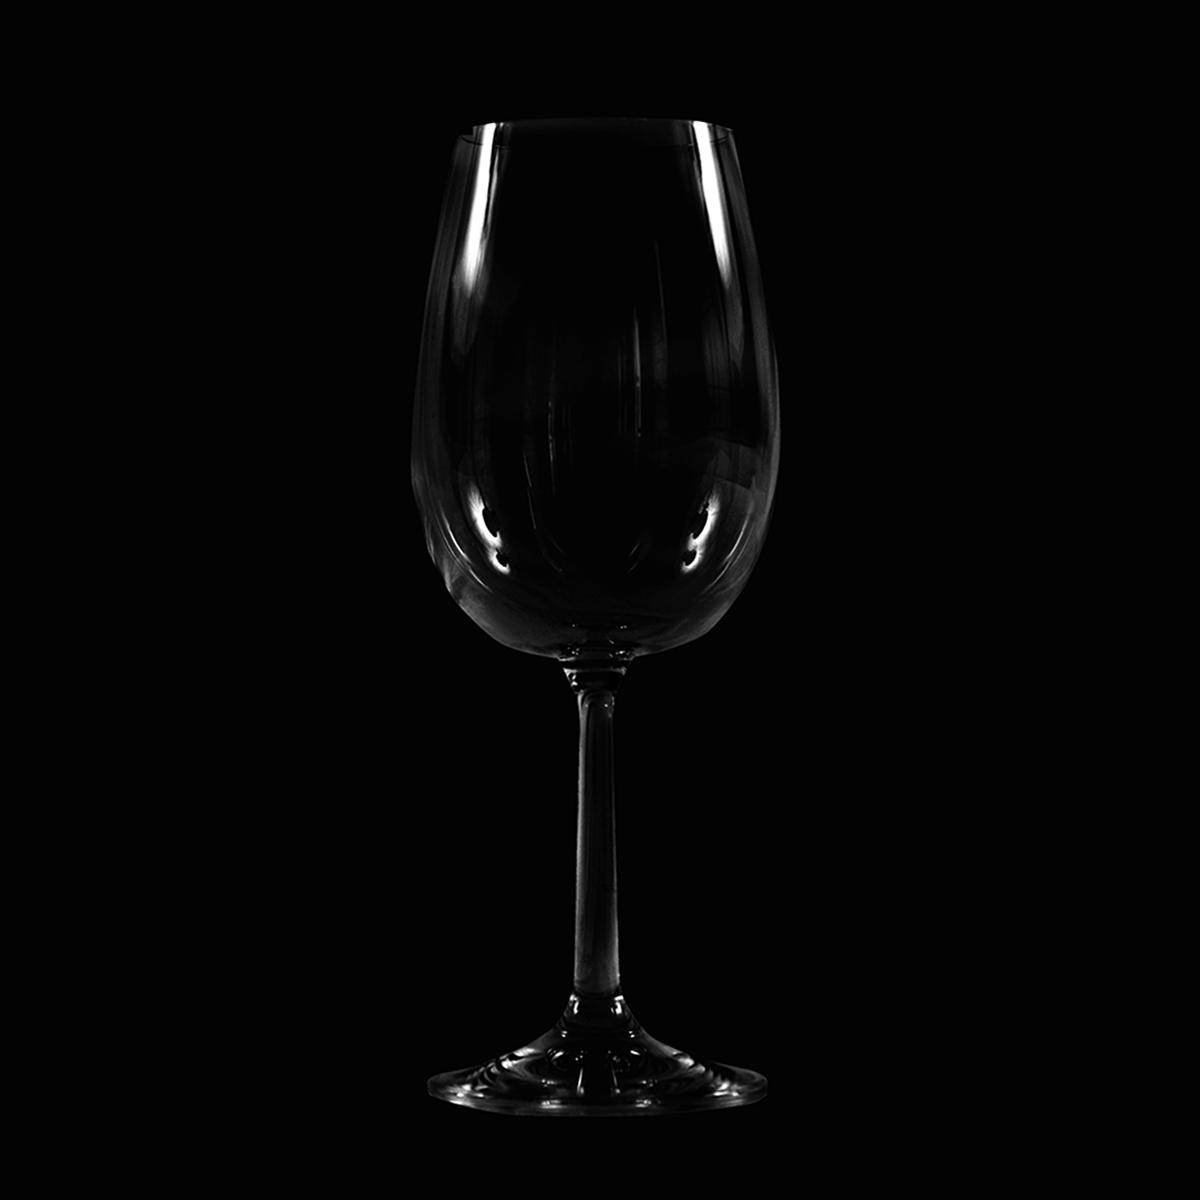 Weinglas Classic (Weißwein) 250 ml